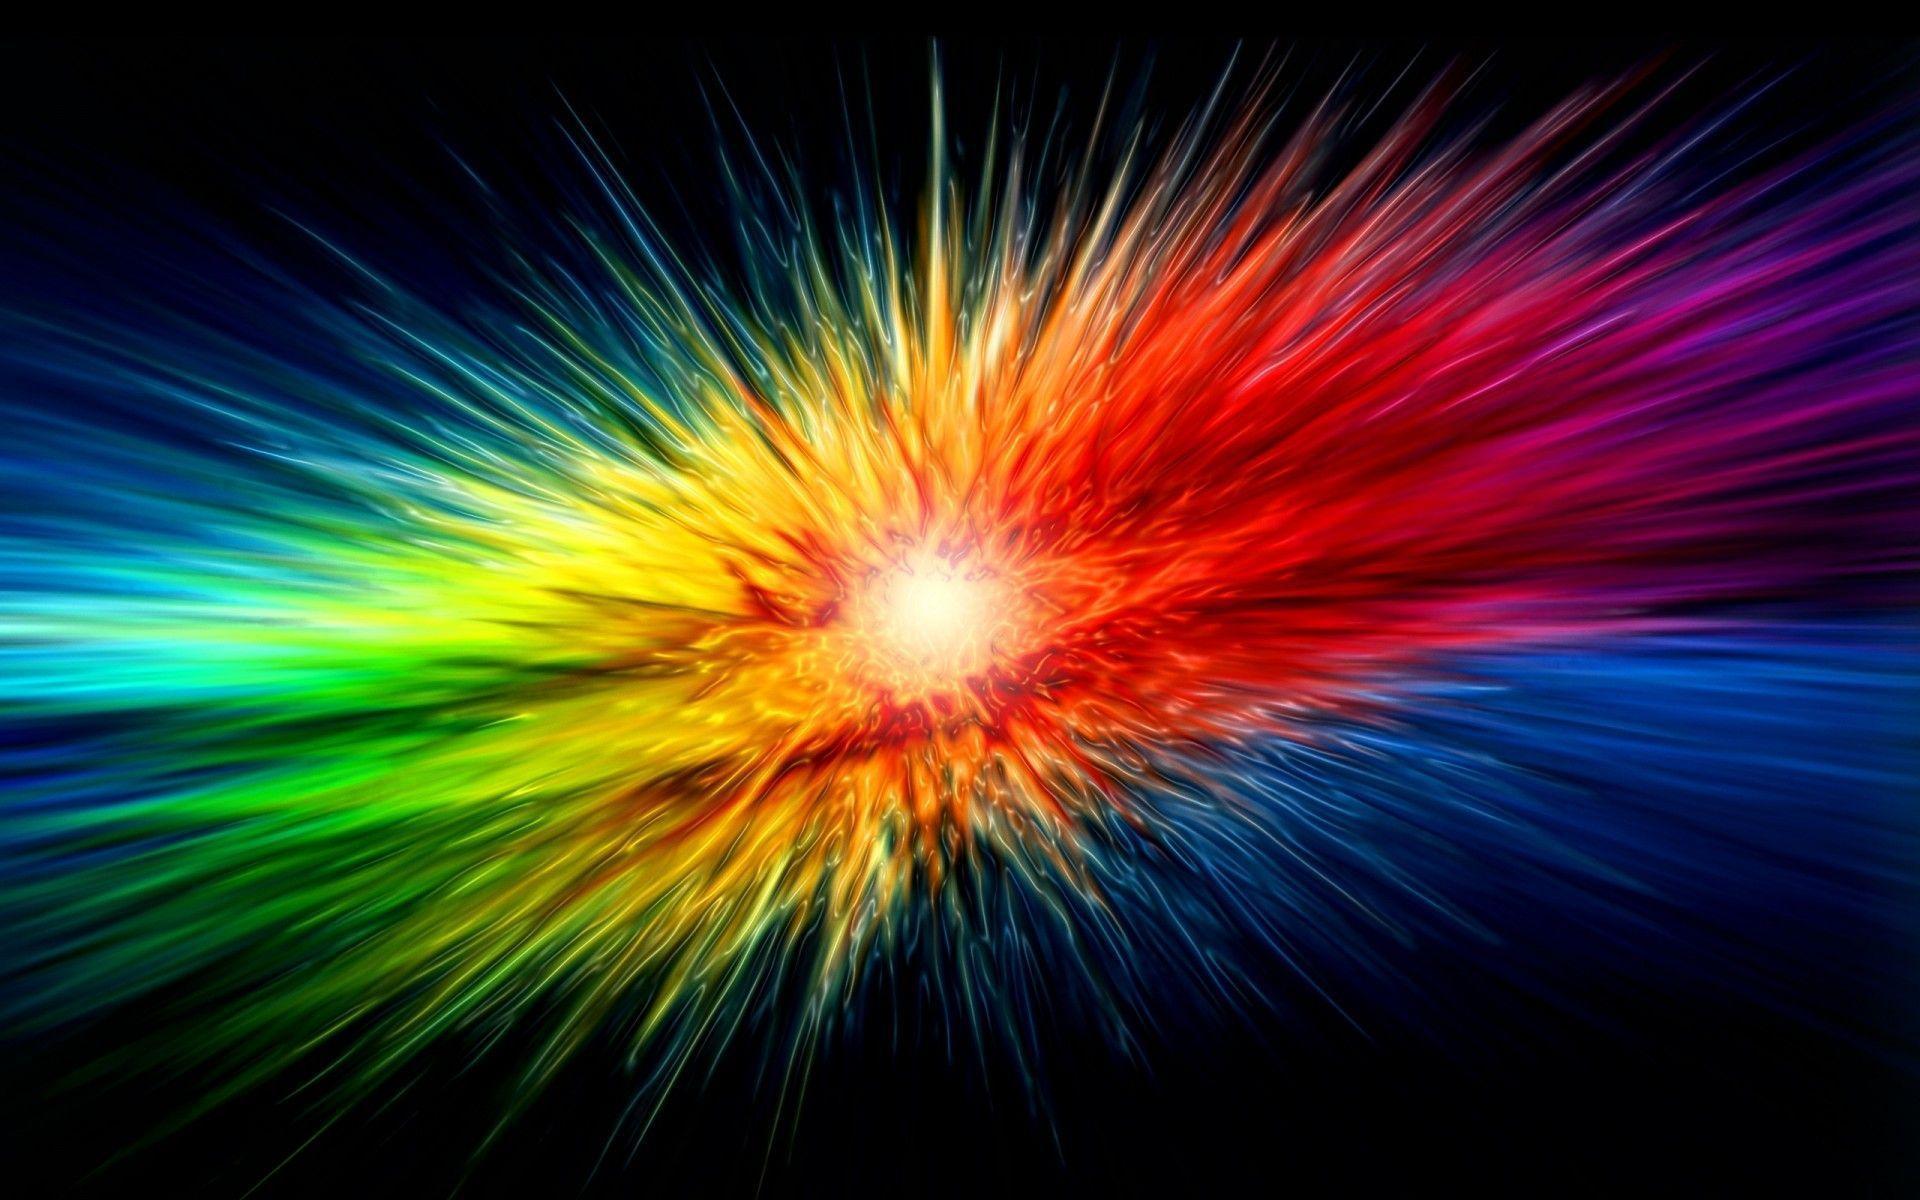 supernova desktop wallpaper - photo #20